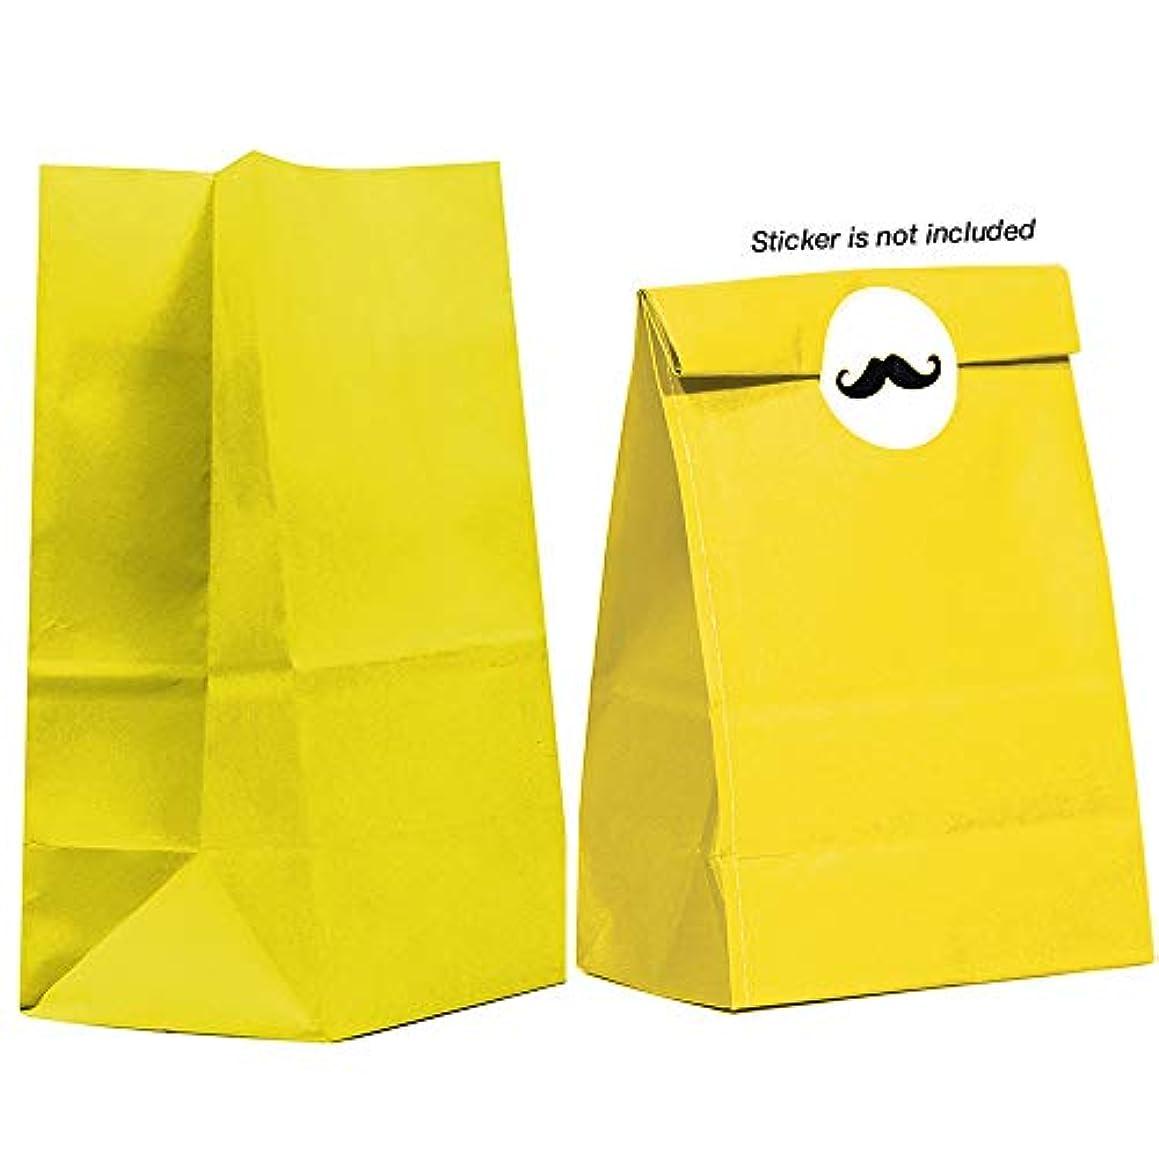 GIFT EXPRESSIONS 60CT Paper Bag, Favor Sack,Biodegradable, Food Safe Ink & Paper, Premium Quality Paper (Thick), Favor Sack, Kraft Paper Sack (60CT Medium, Yellow)